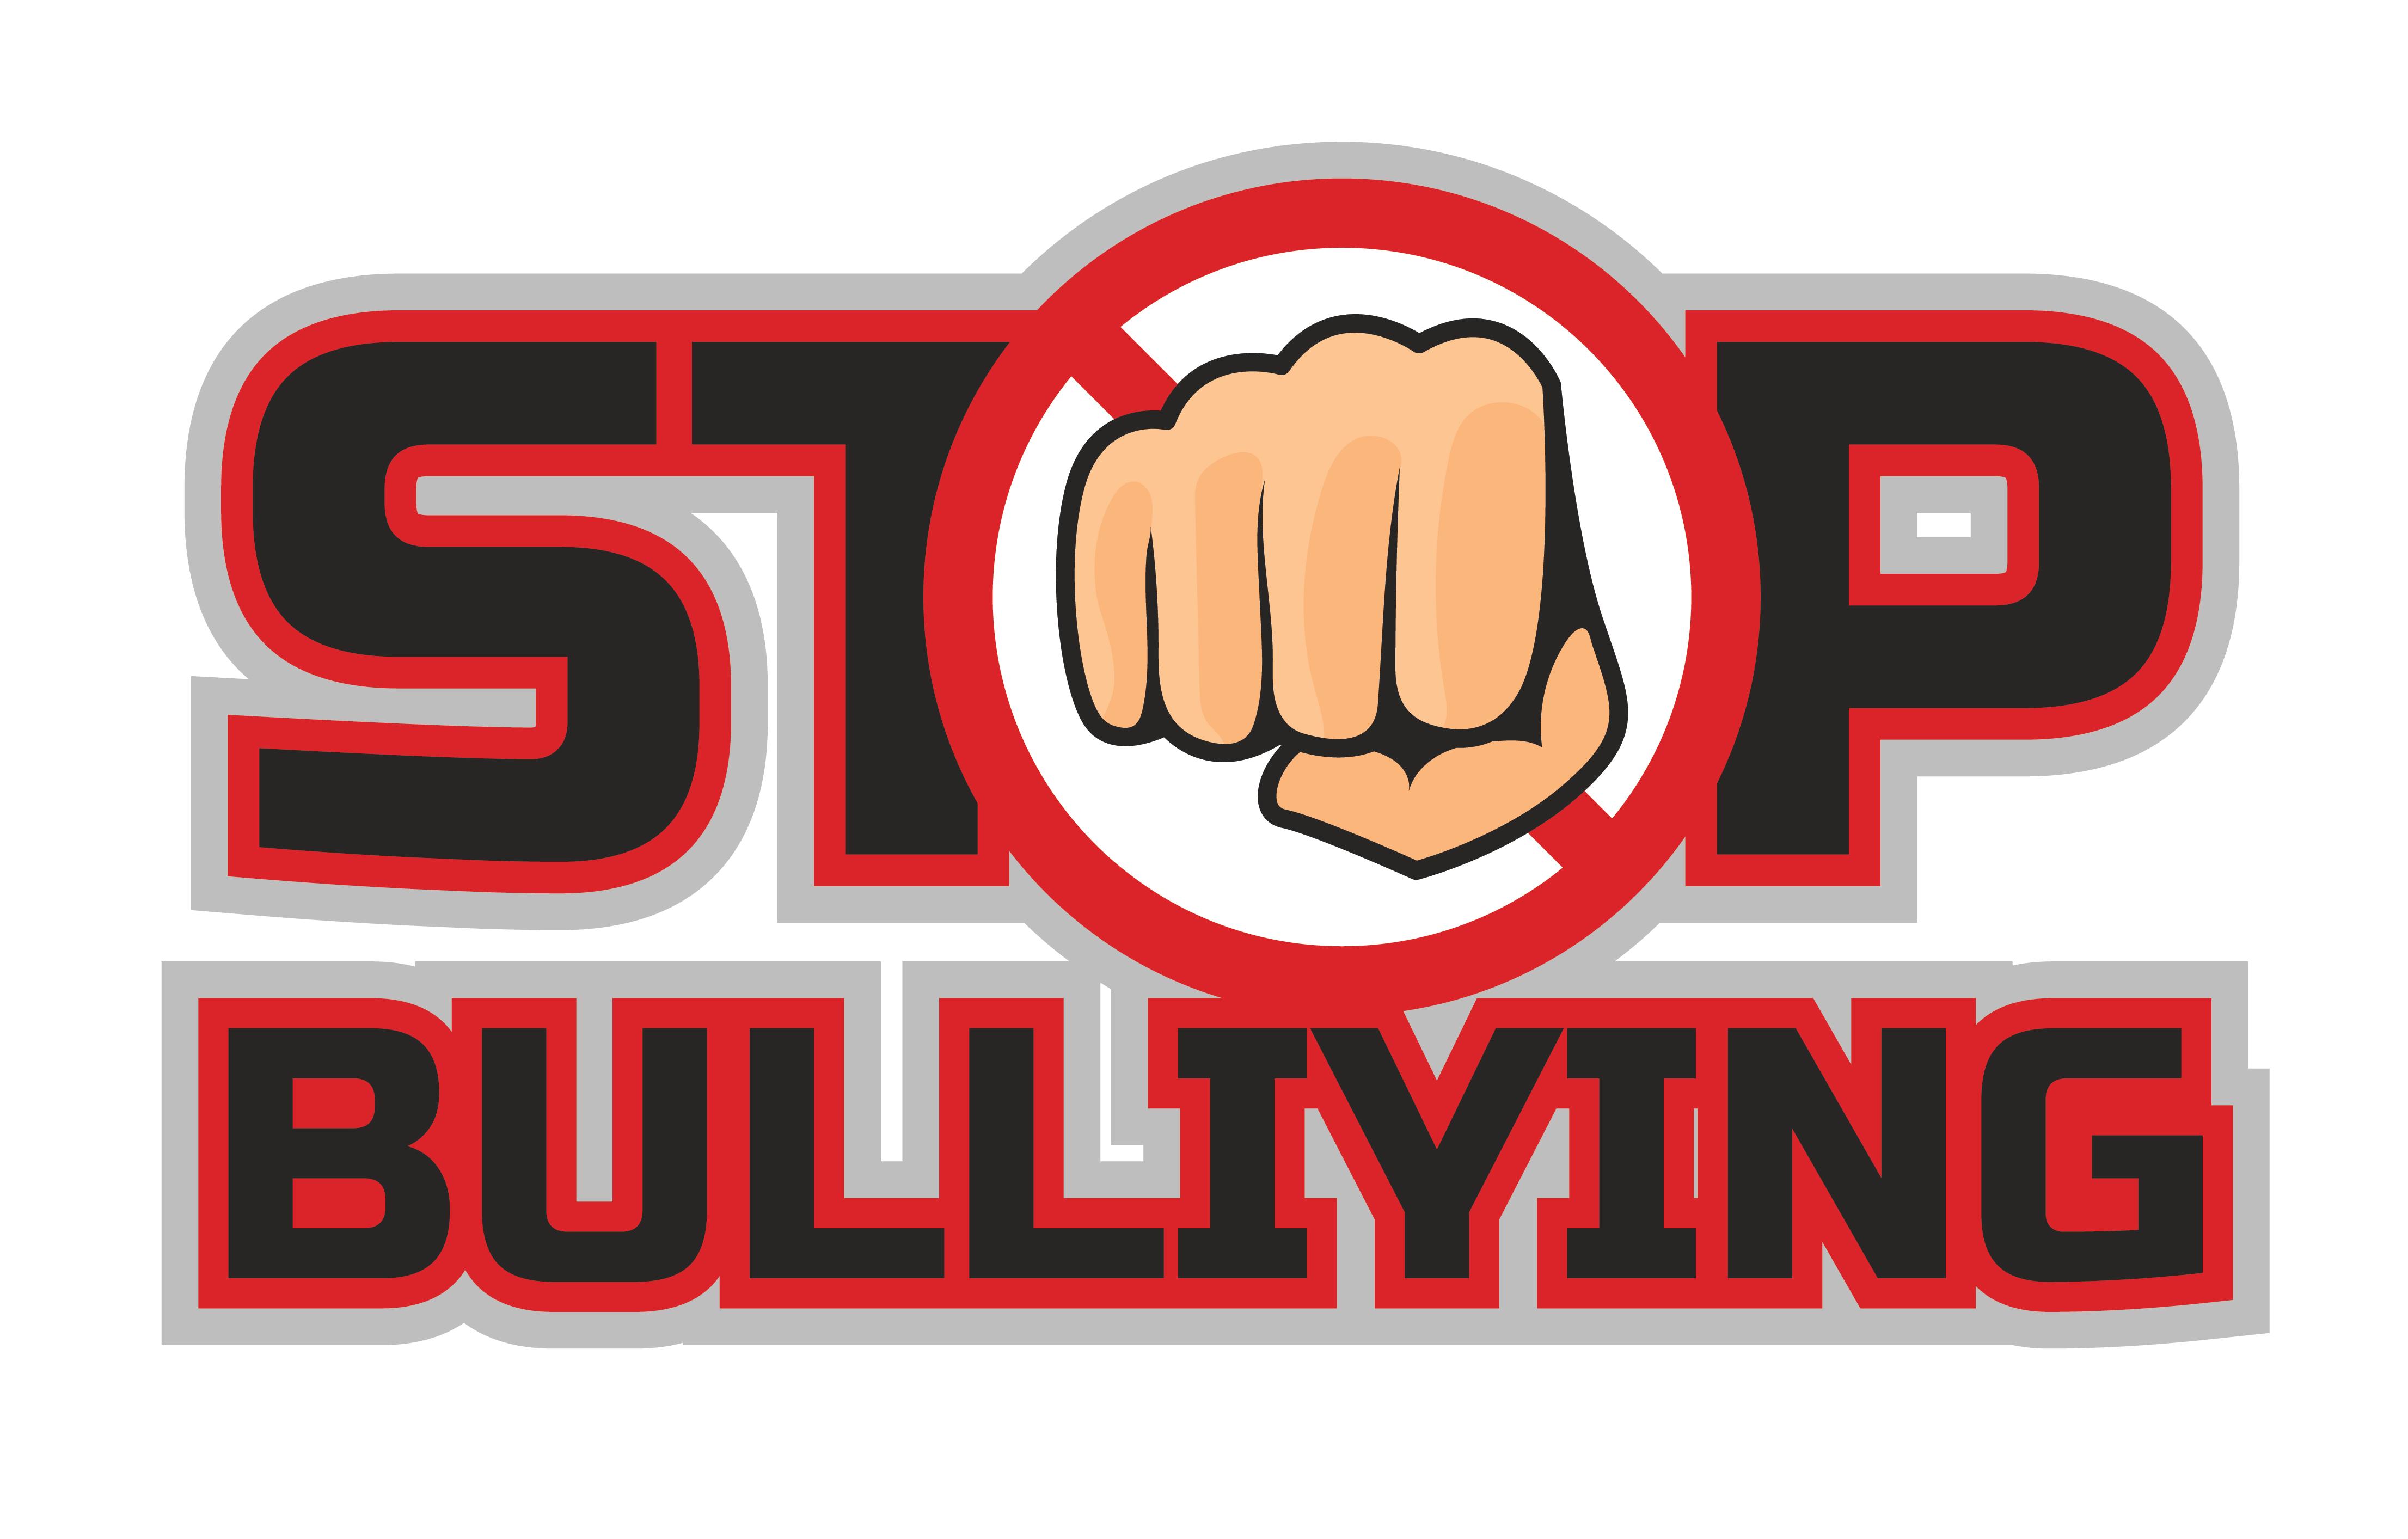 —Pngtree—stop bullying no bullying logo_4011438